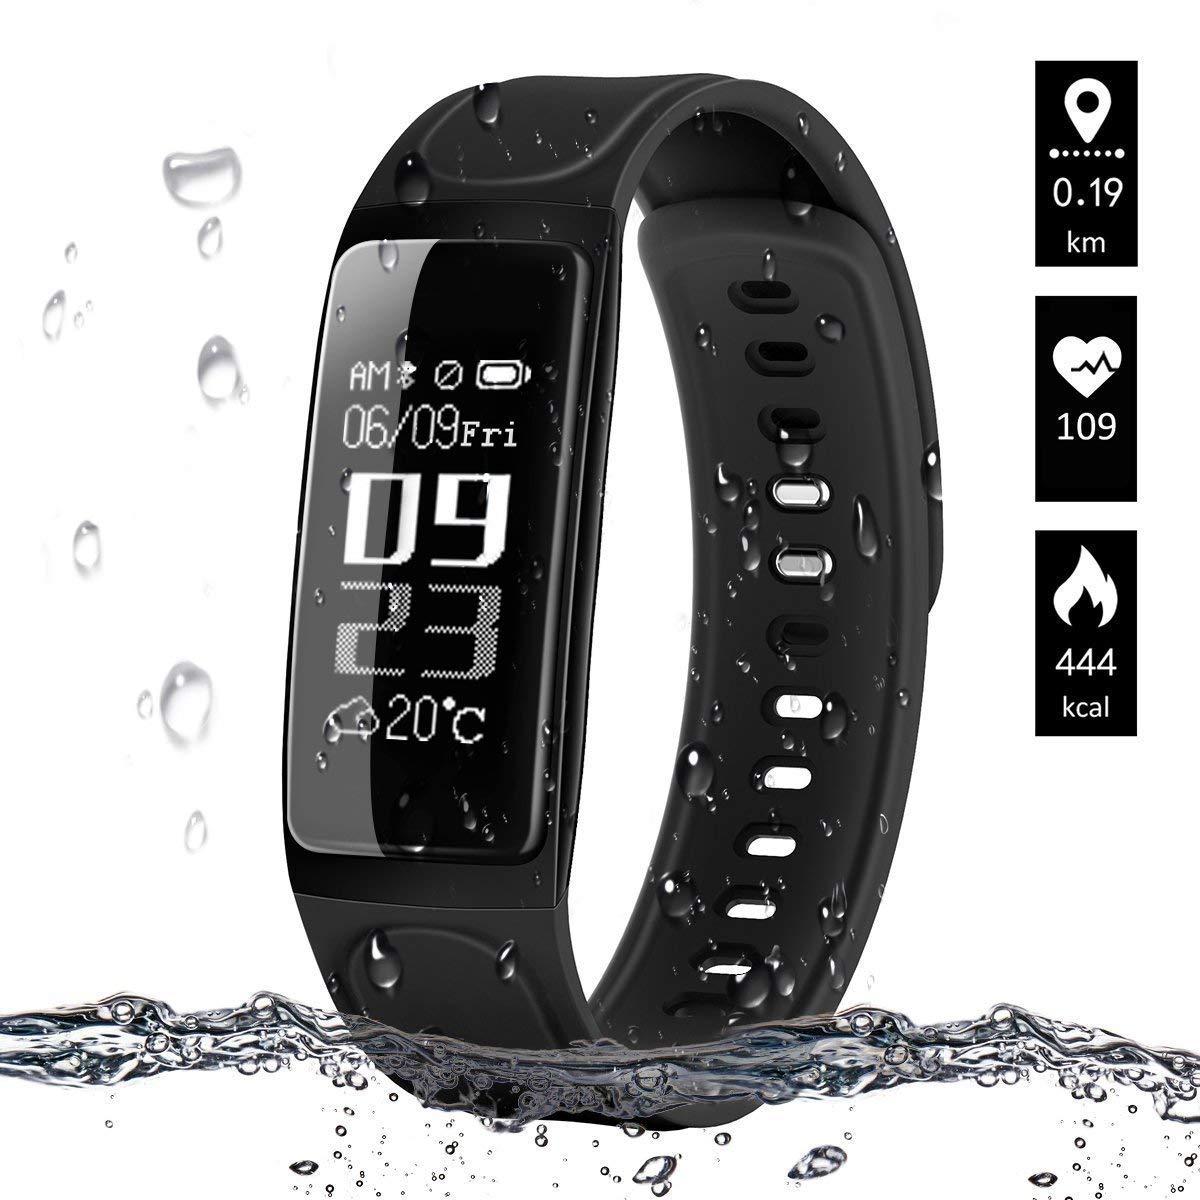 ELEGIANT Fitness Tracker, Fitness Armband Aktivitätstracker Schrittzähler Uhr Sport Watch